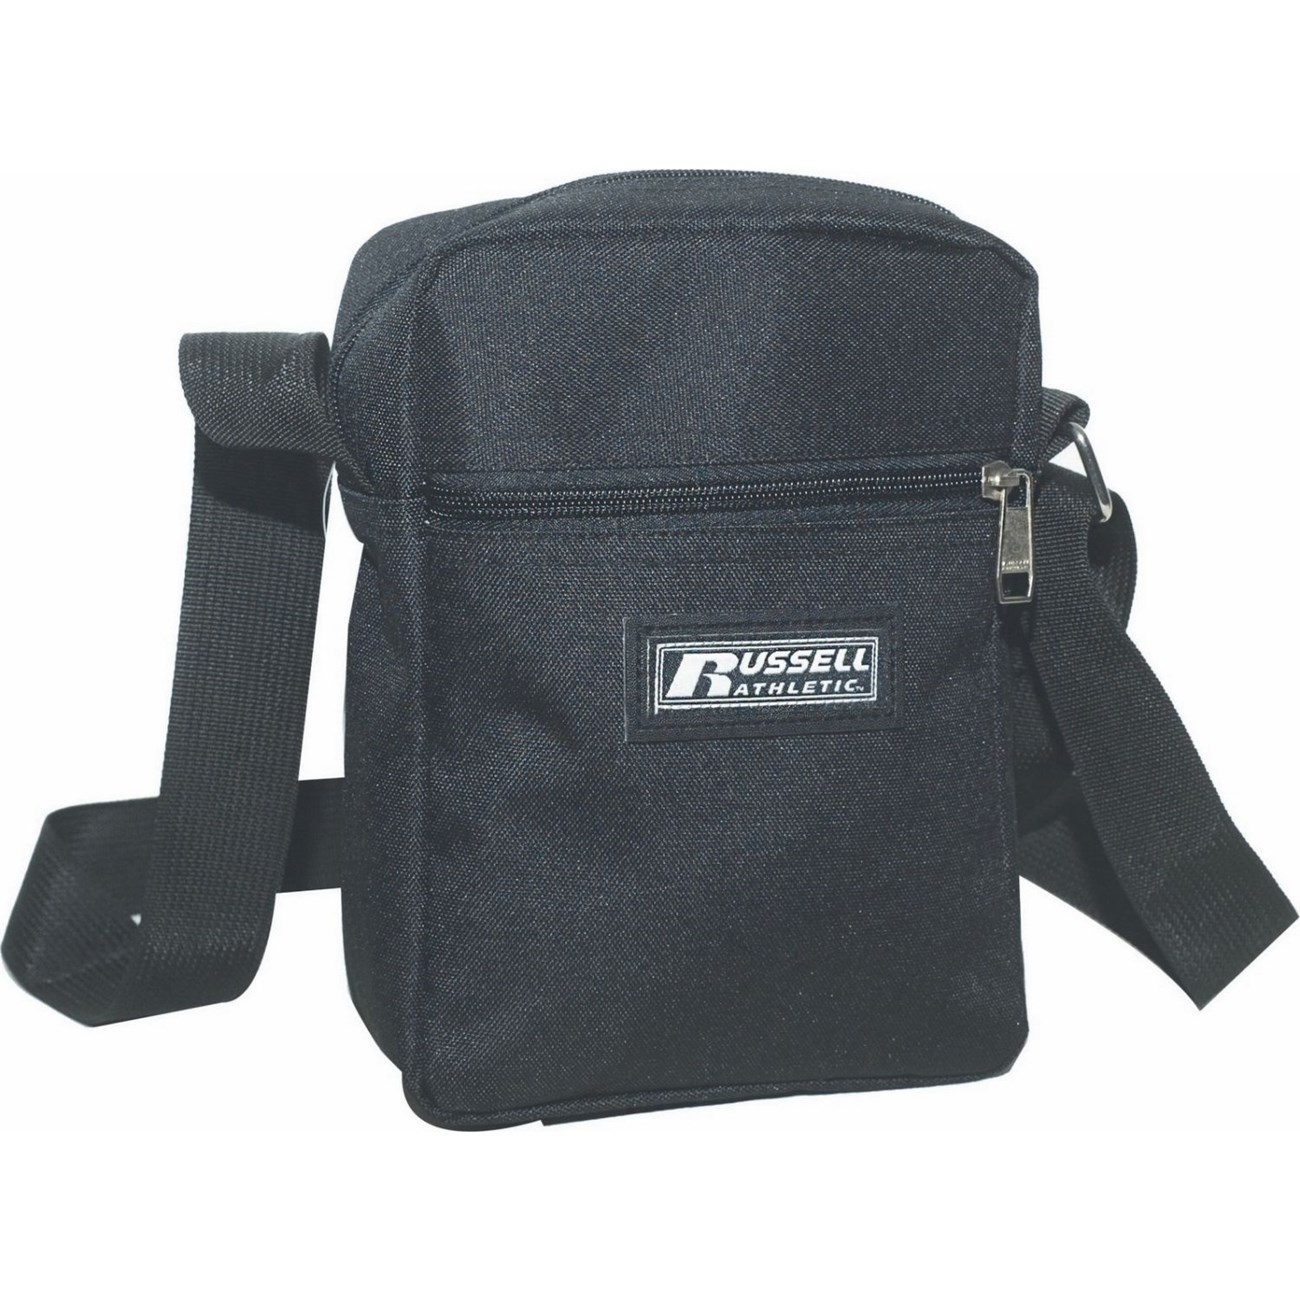 2eed129e0aa RUSSELL ATHLETIC AUBURN SHOULDER BAG < Τσάντες & Σακίδια | INTERSPORT